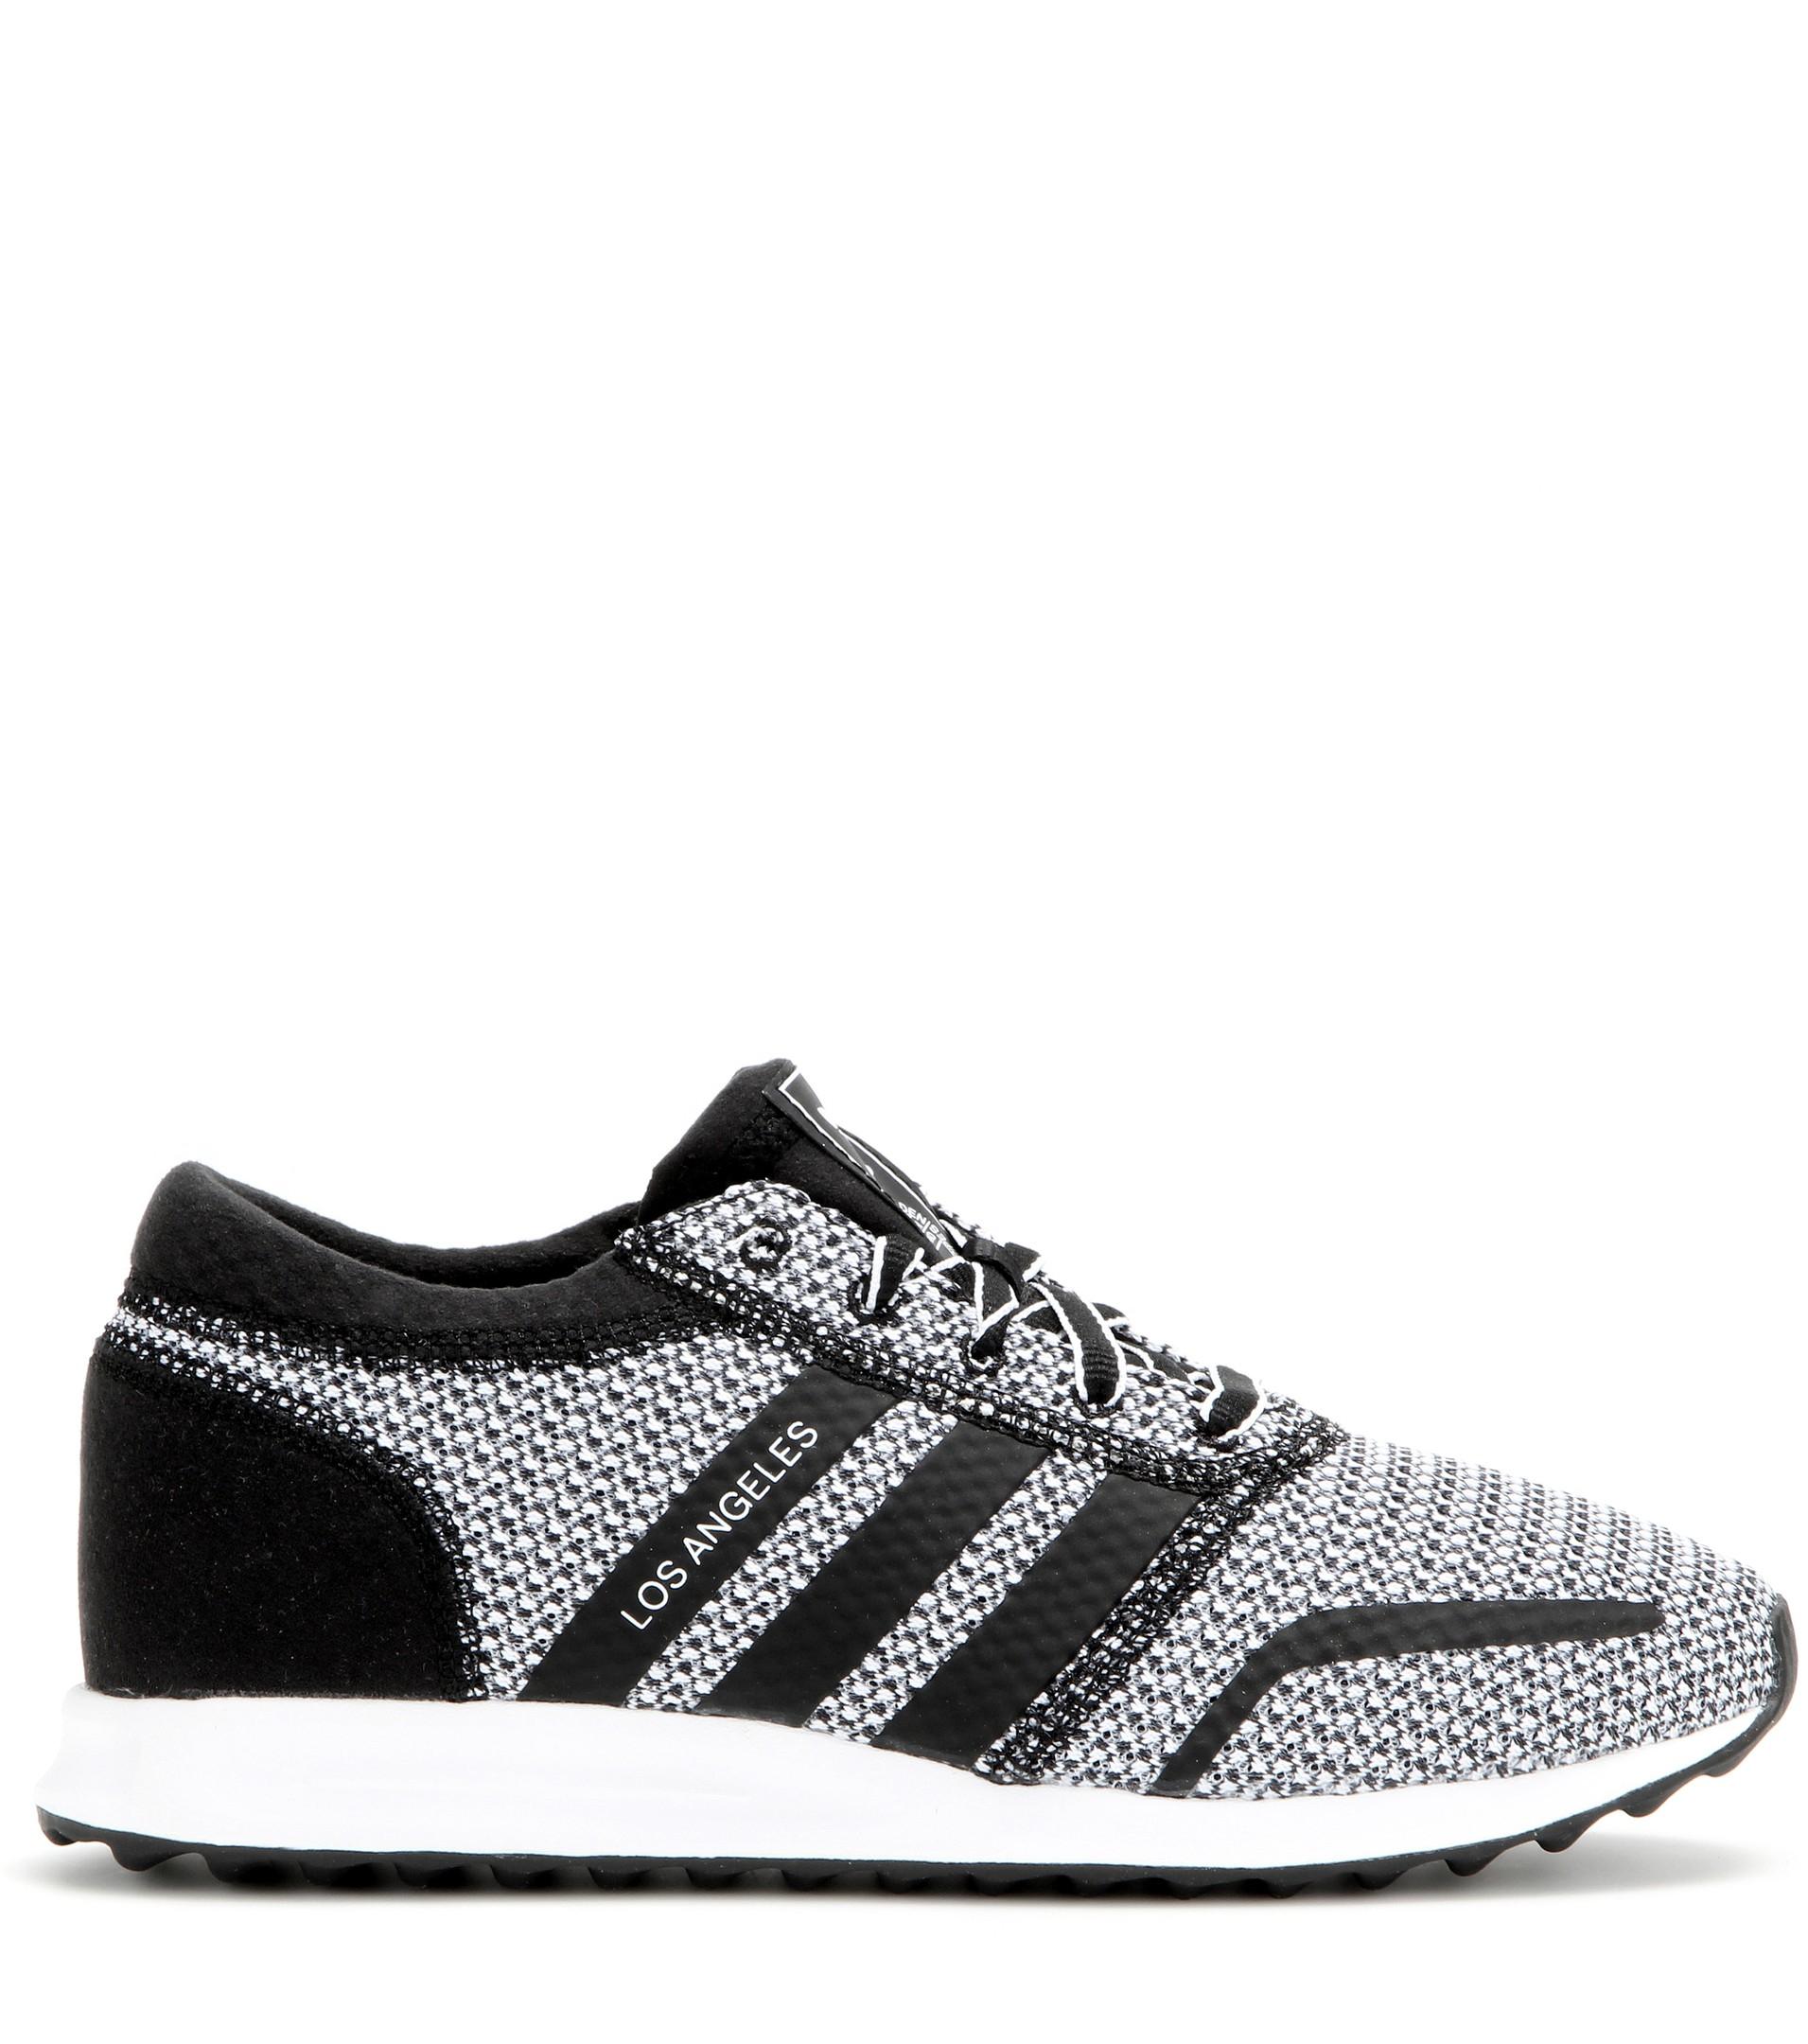 Lyst - adidas Los Angeles Sneakers in Gray 9489de2b7